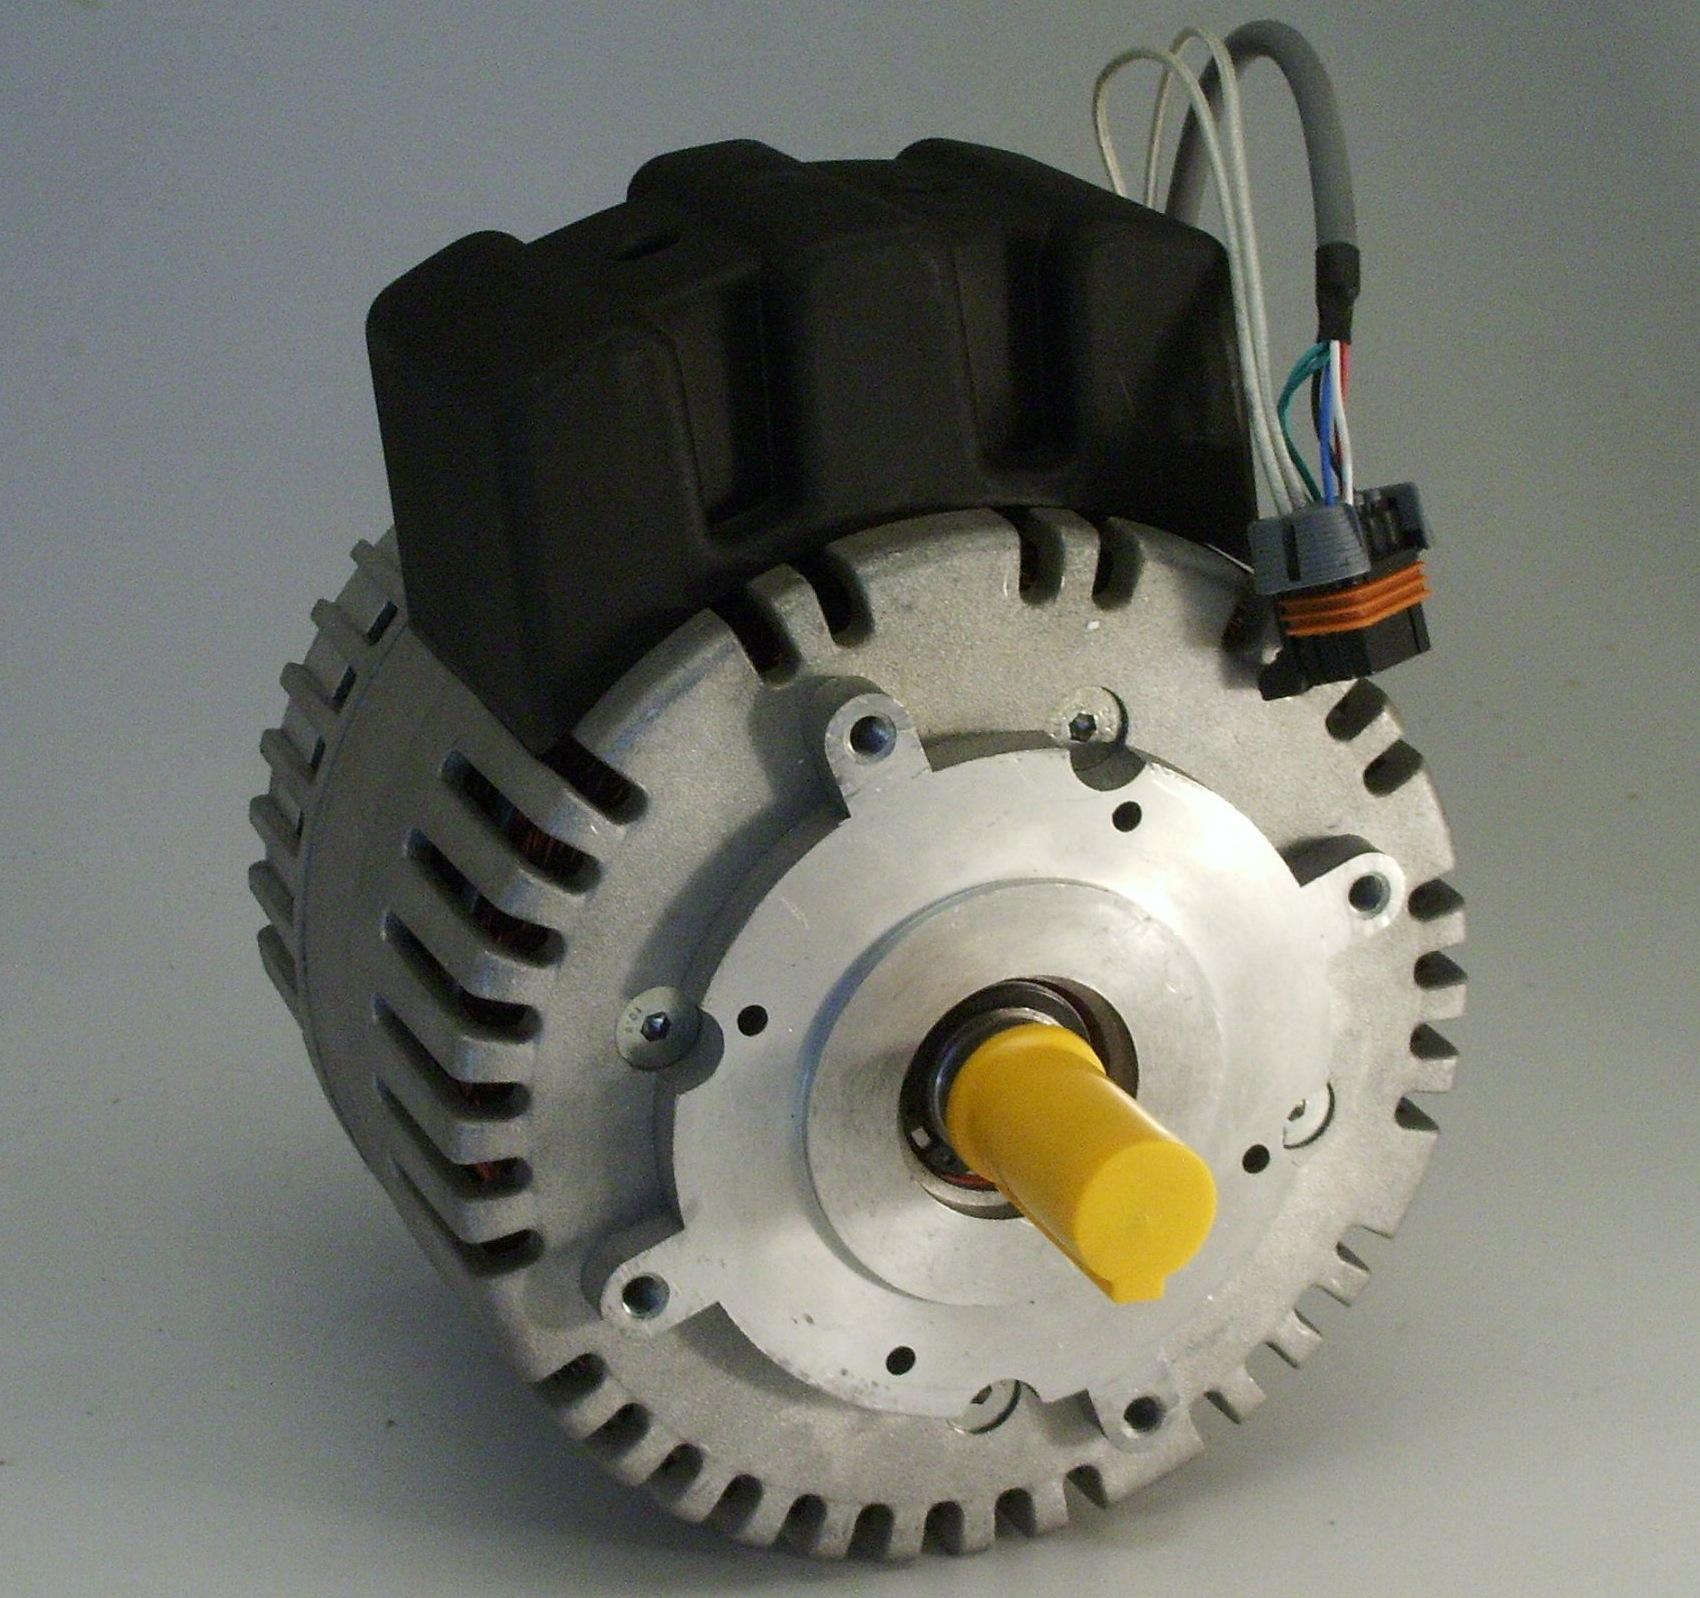 electricdriveengineering.com.au